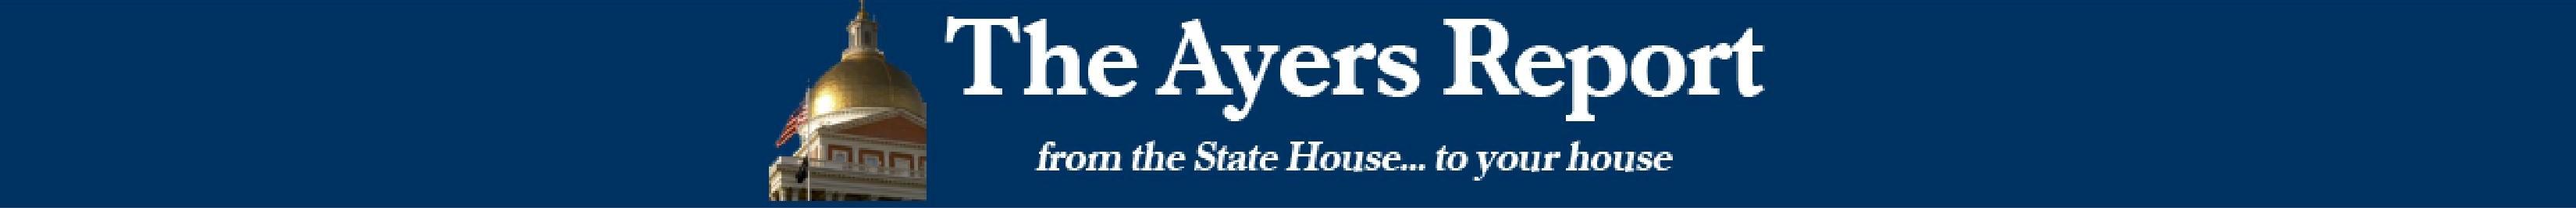 Ayers_Report_Header.jpg